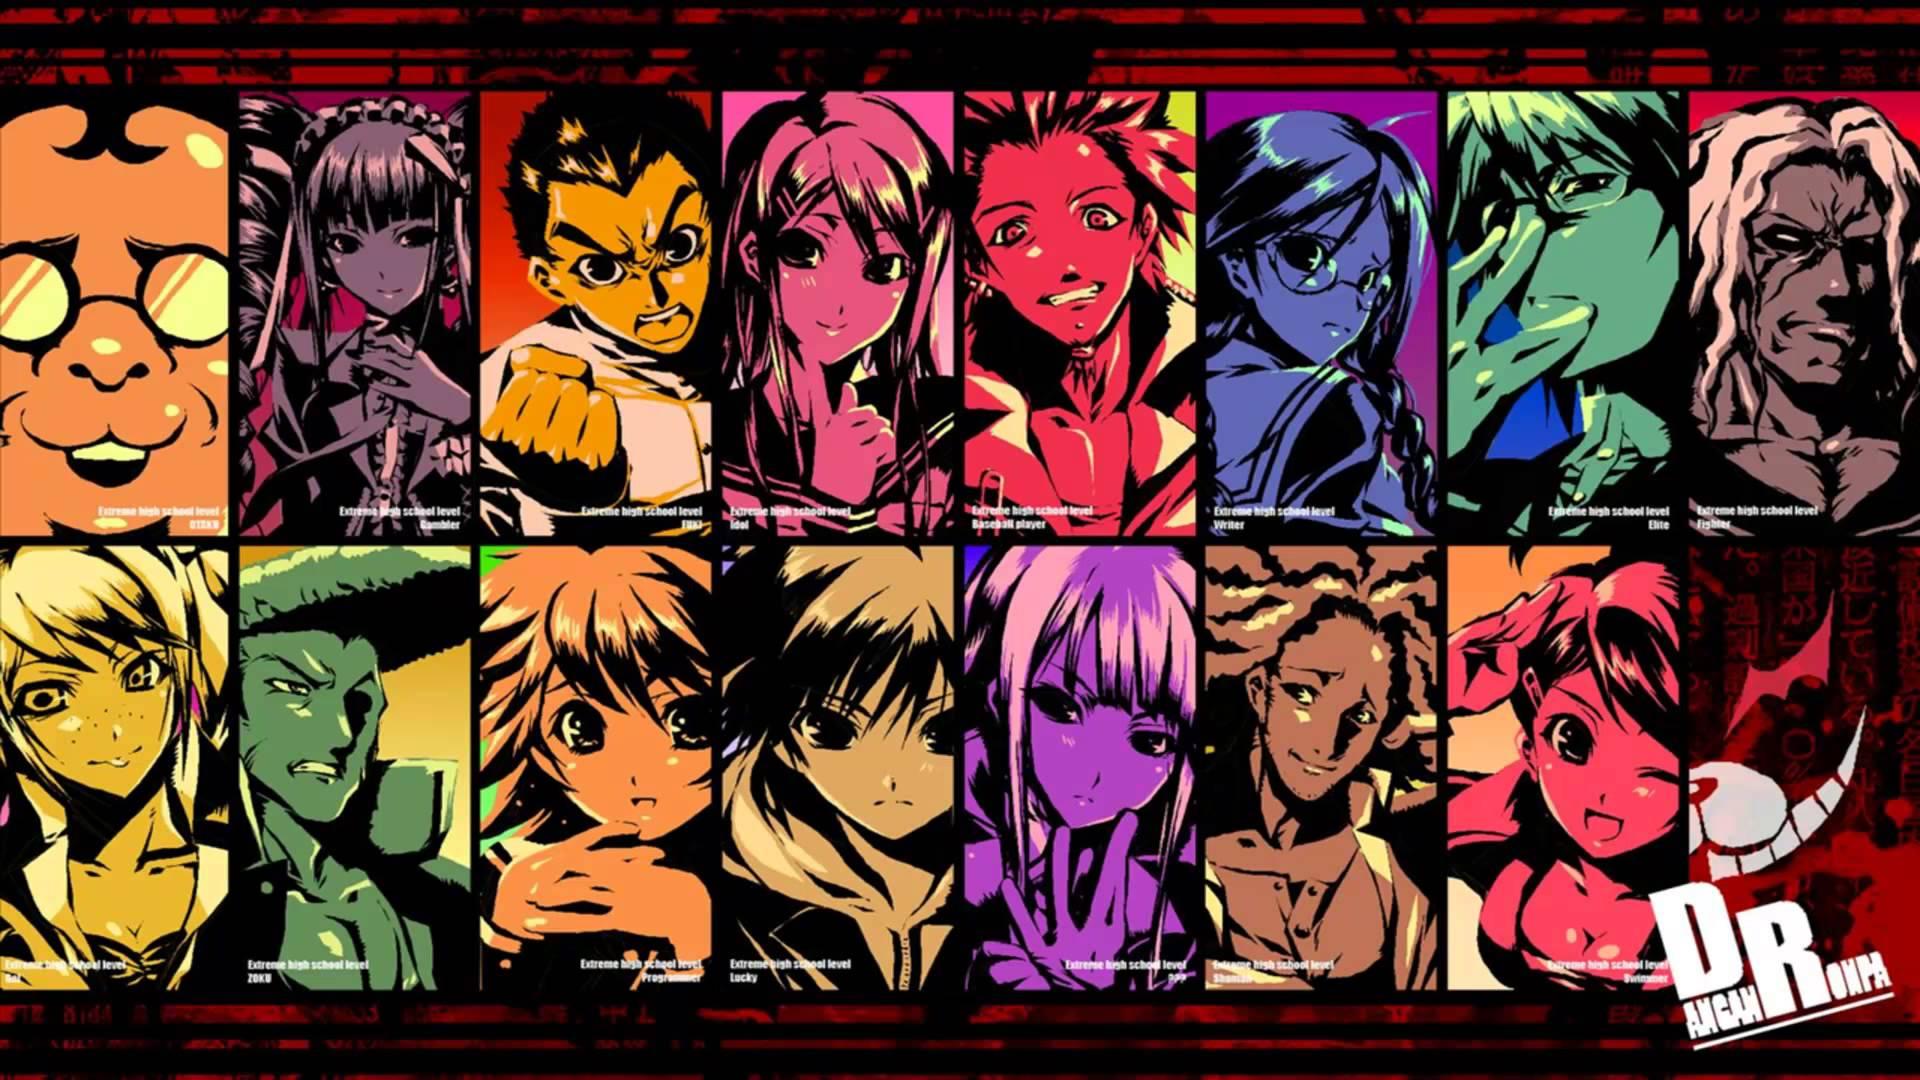 wallpaper hd danganronpa the - photo #4